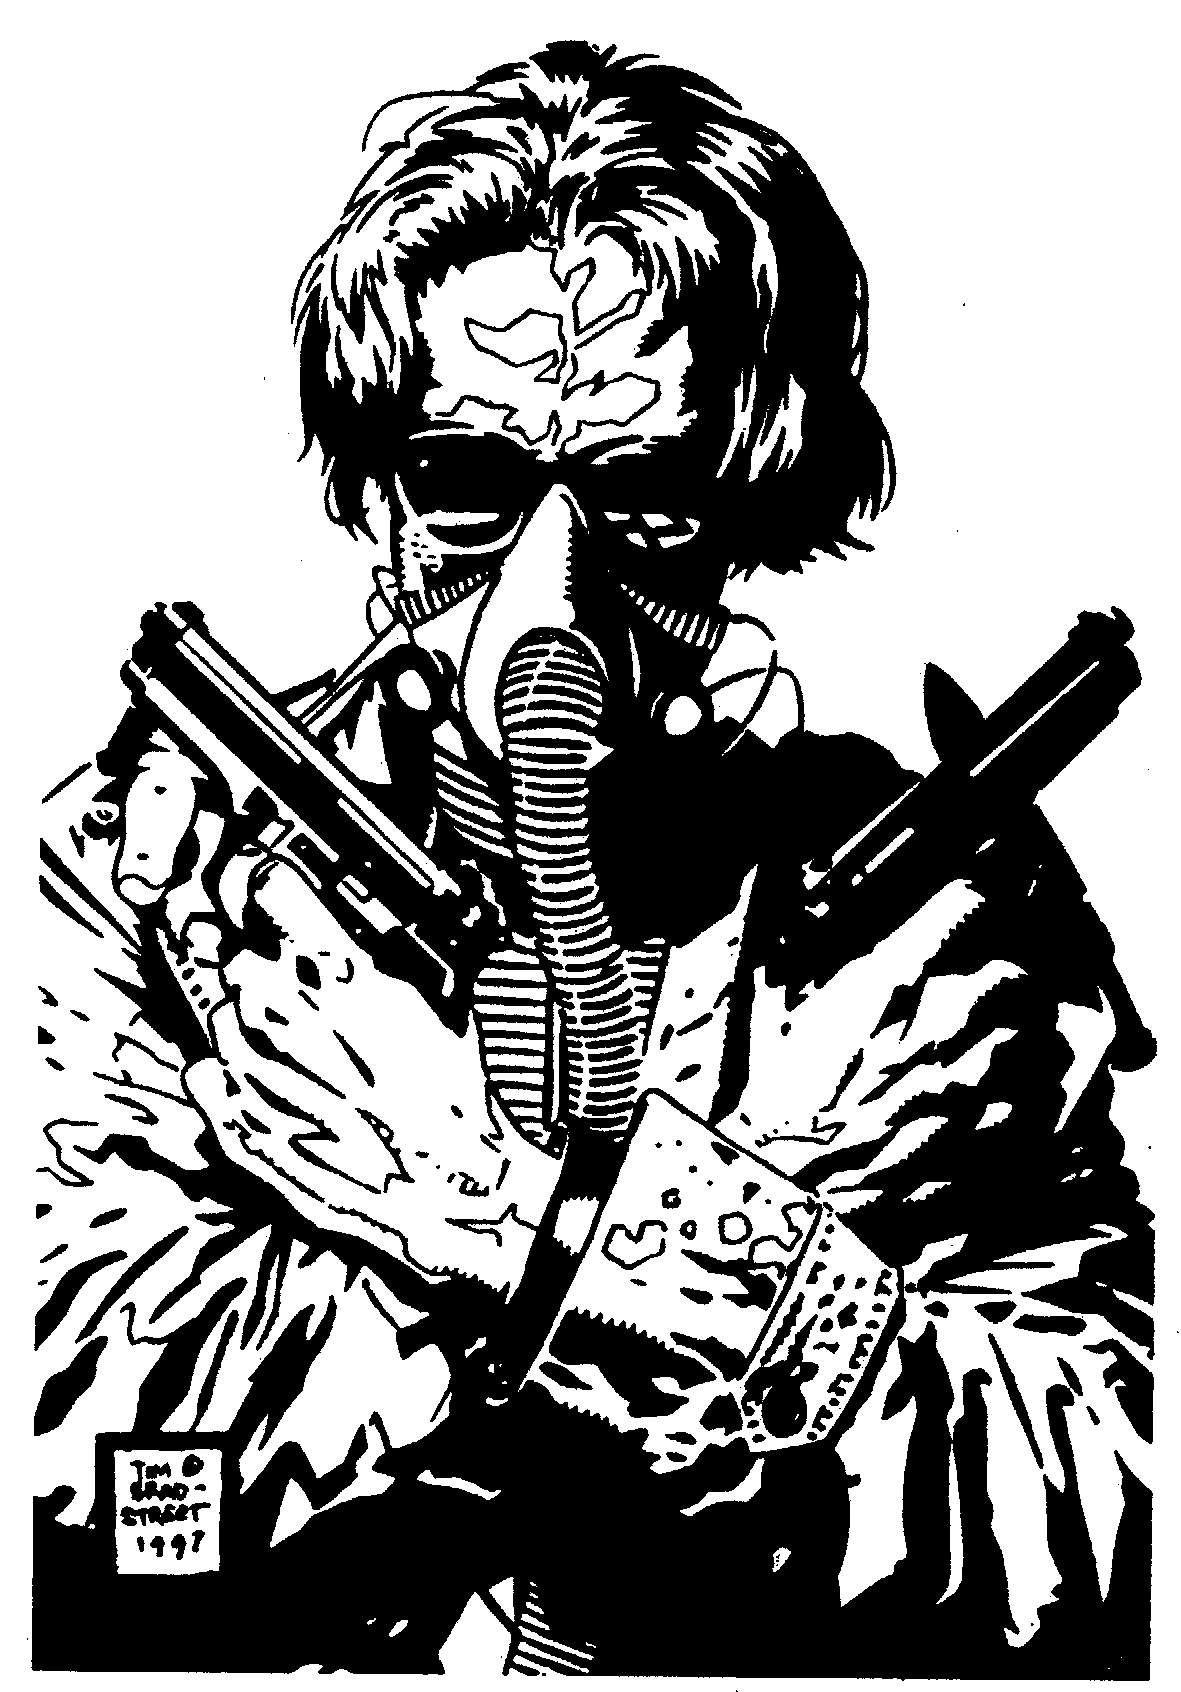 Tim BratStrett (With images) Cyberpunk, Apocalypse, Anime